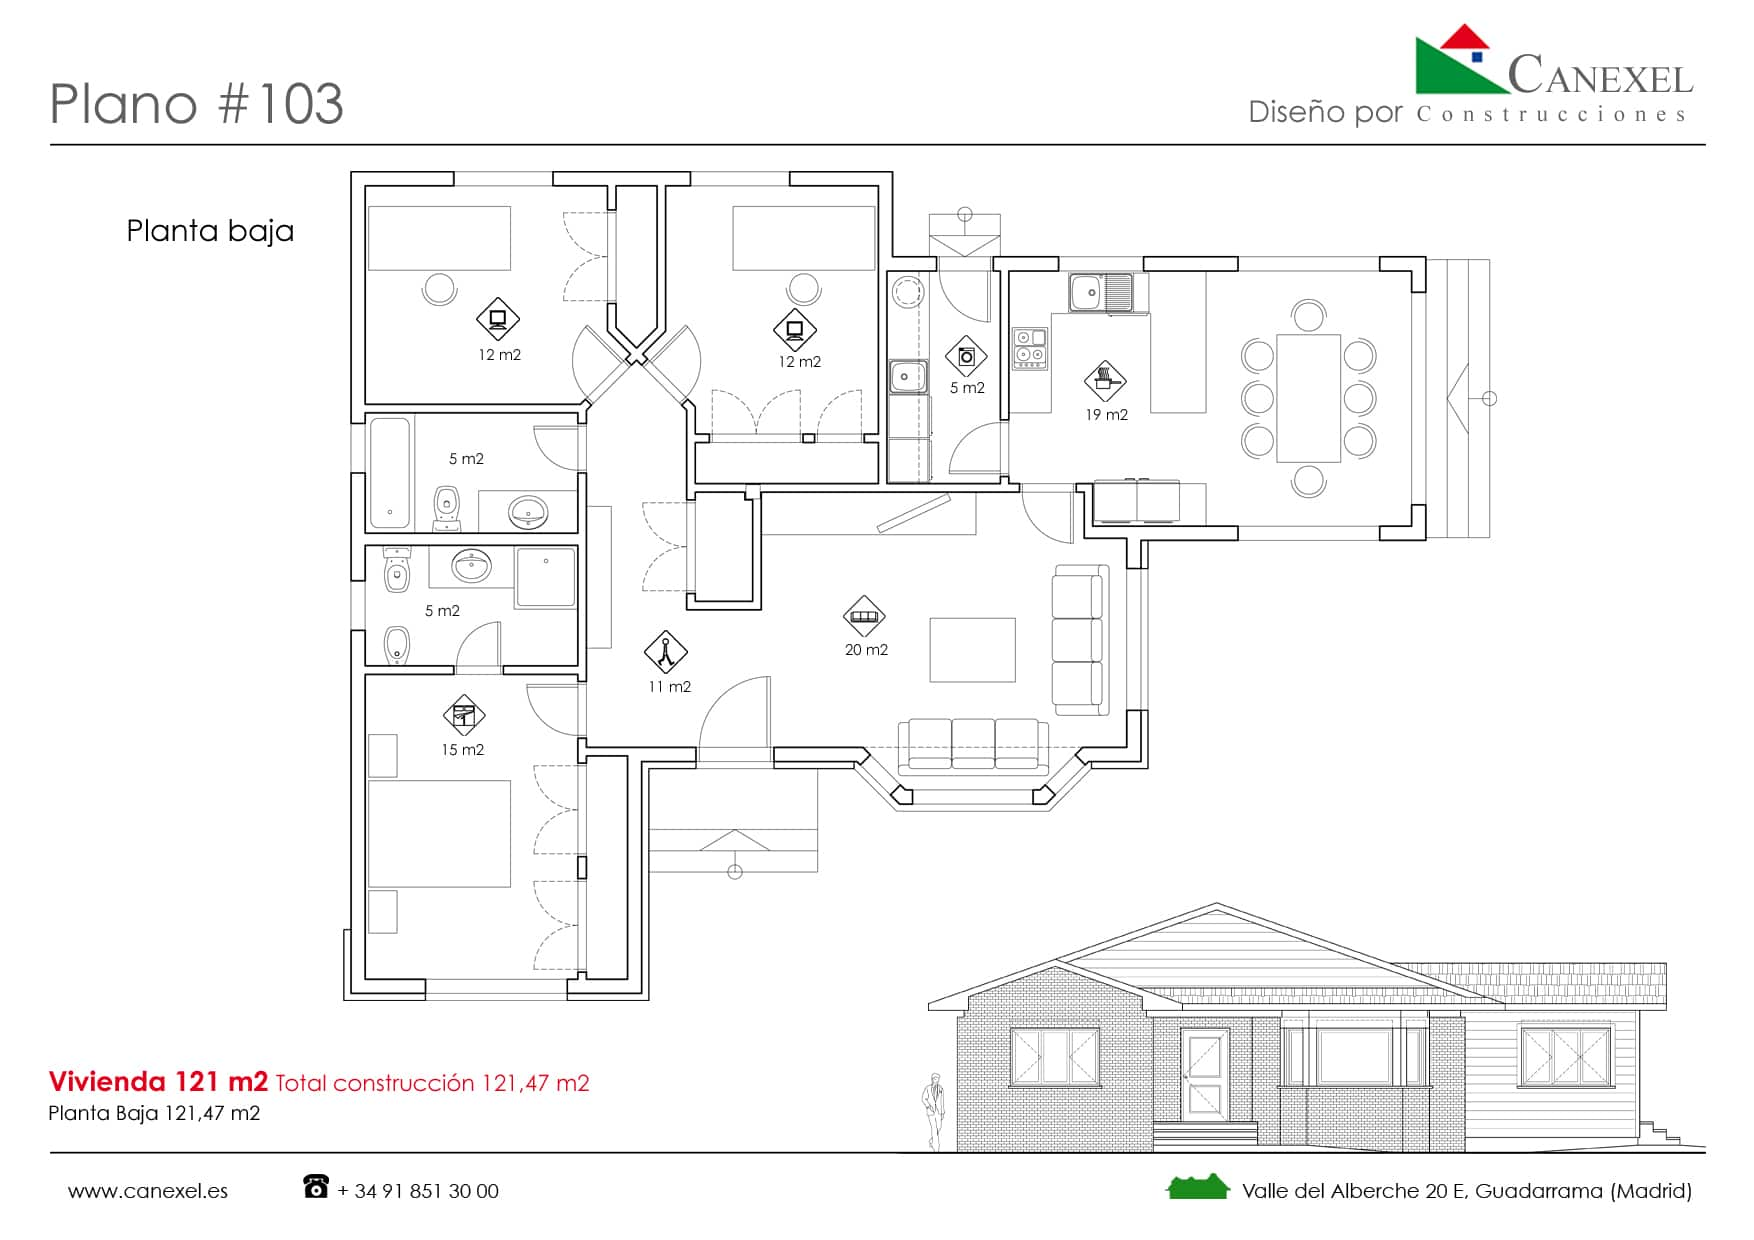 Planos de casas de una planta canexel for Casa moderna 50 metros cuadrados